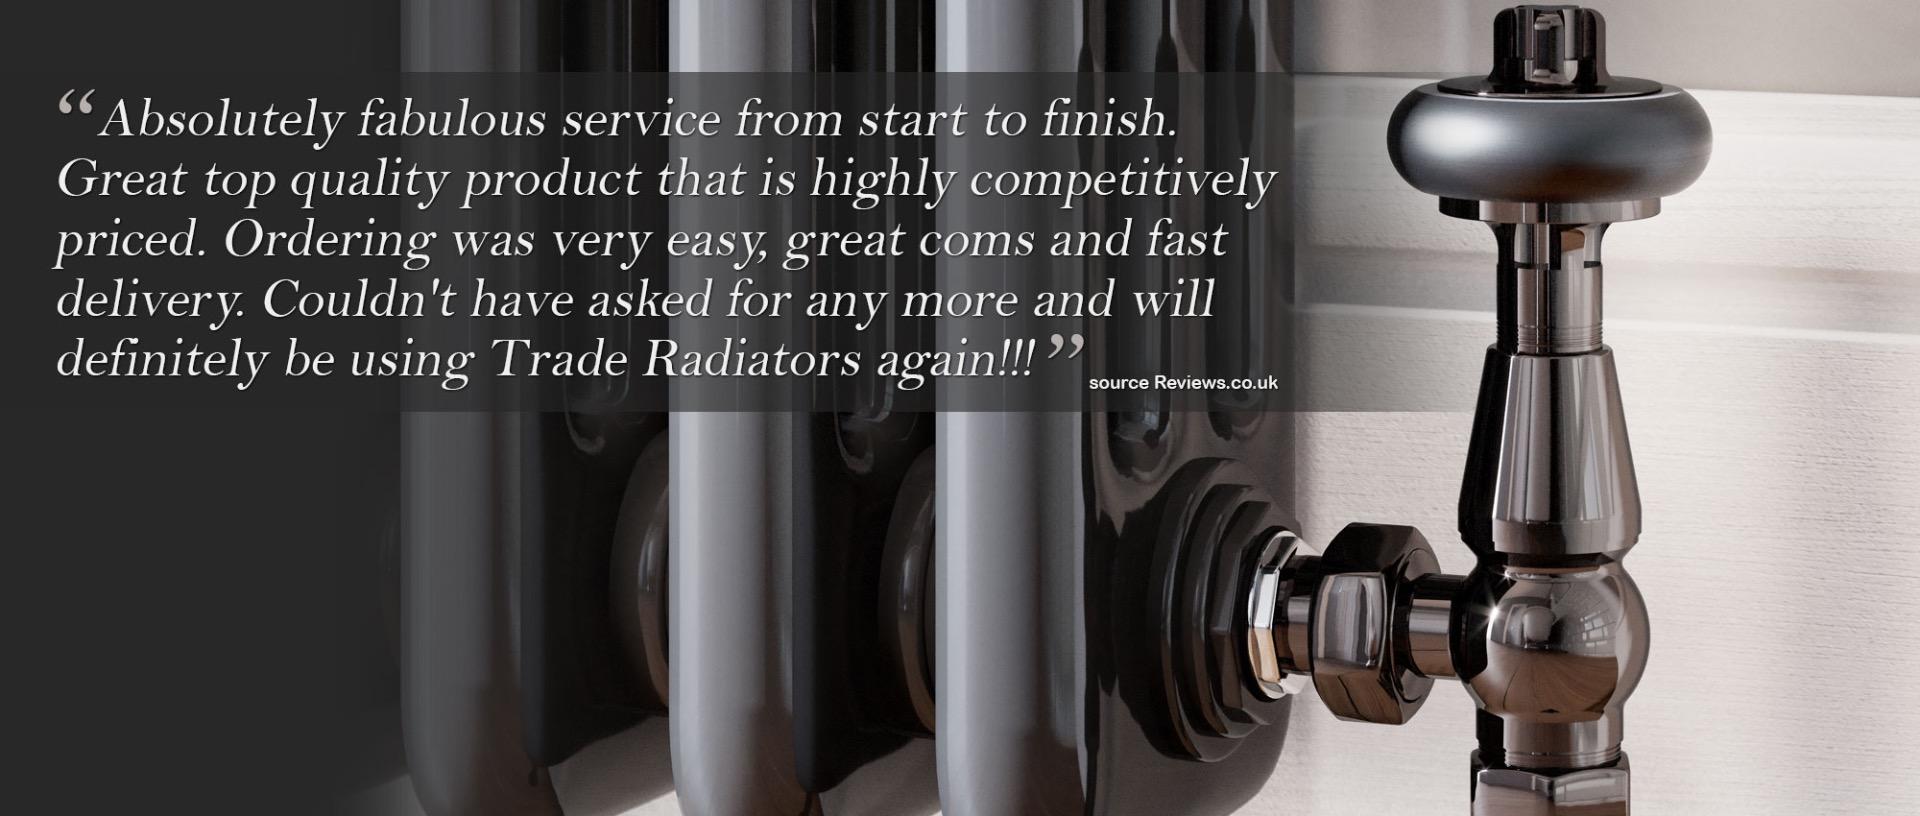 Radiator Valve Header Image